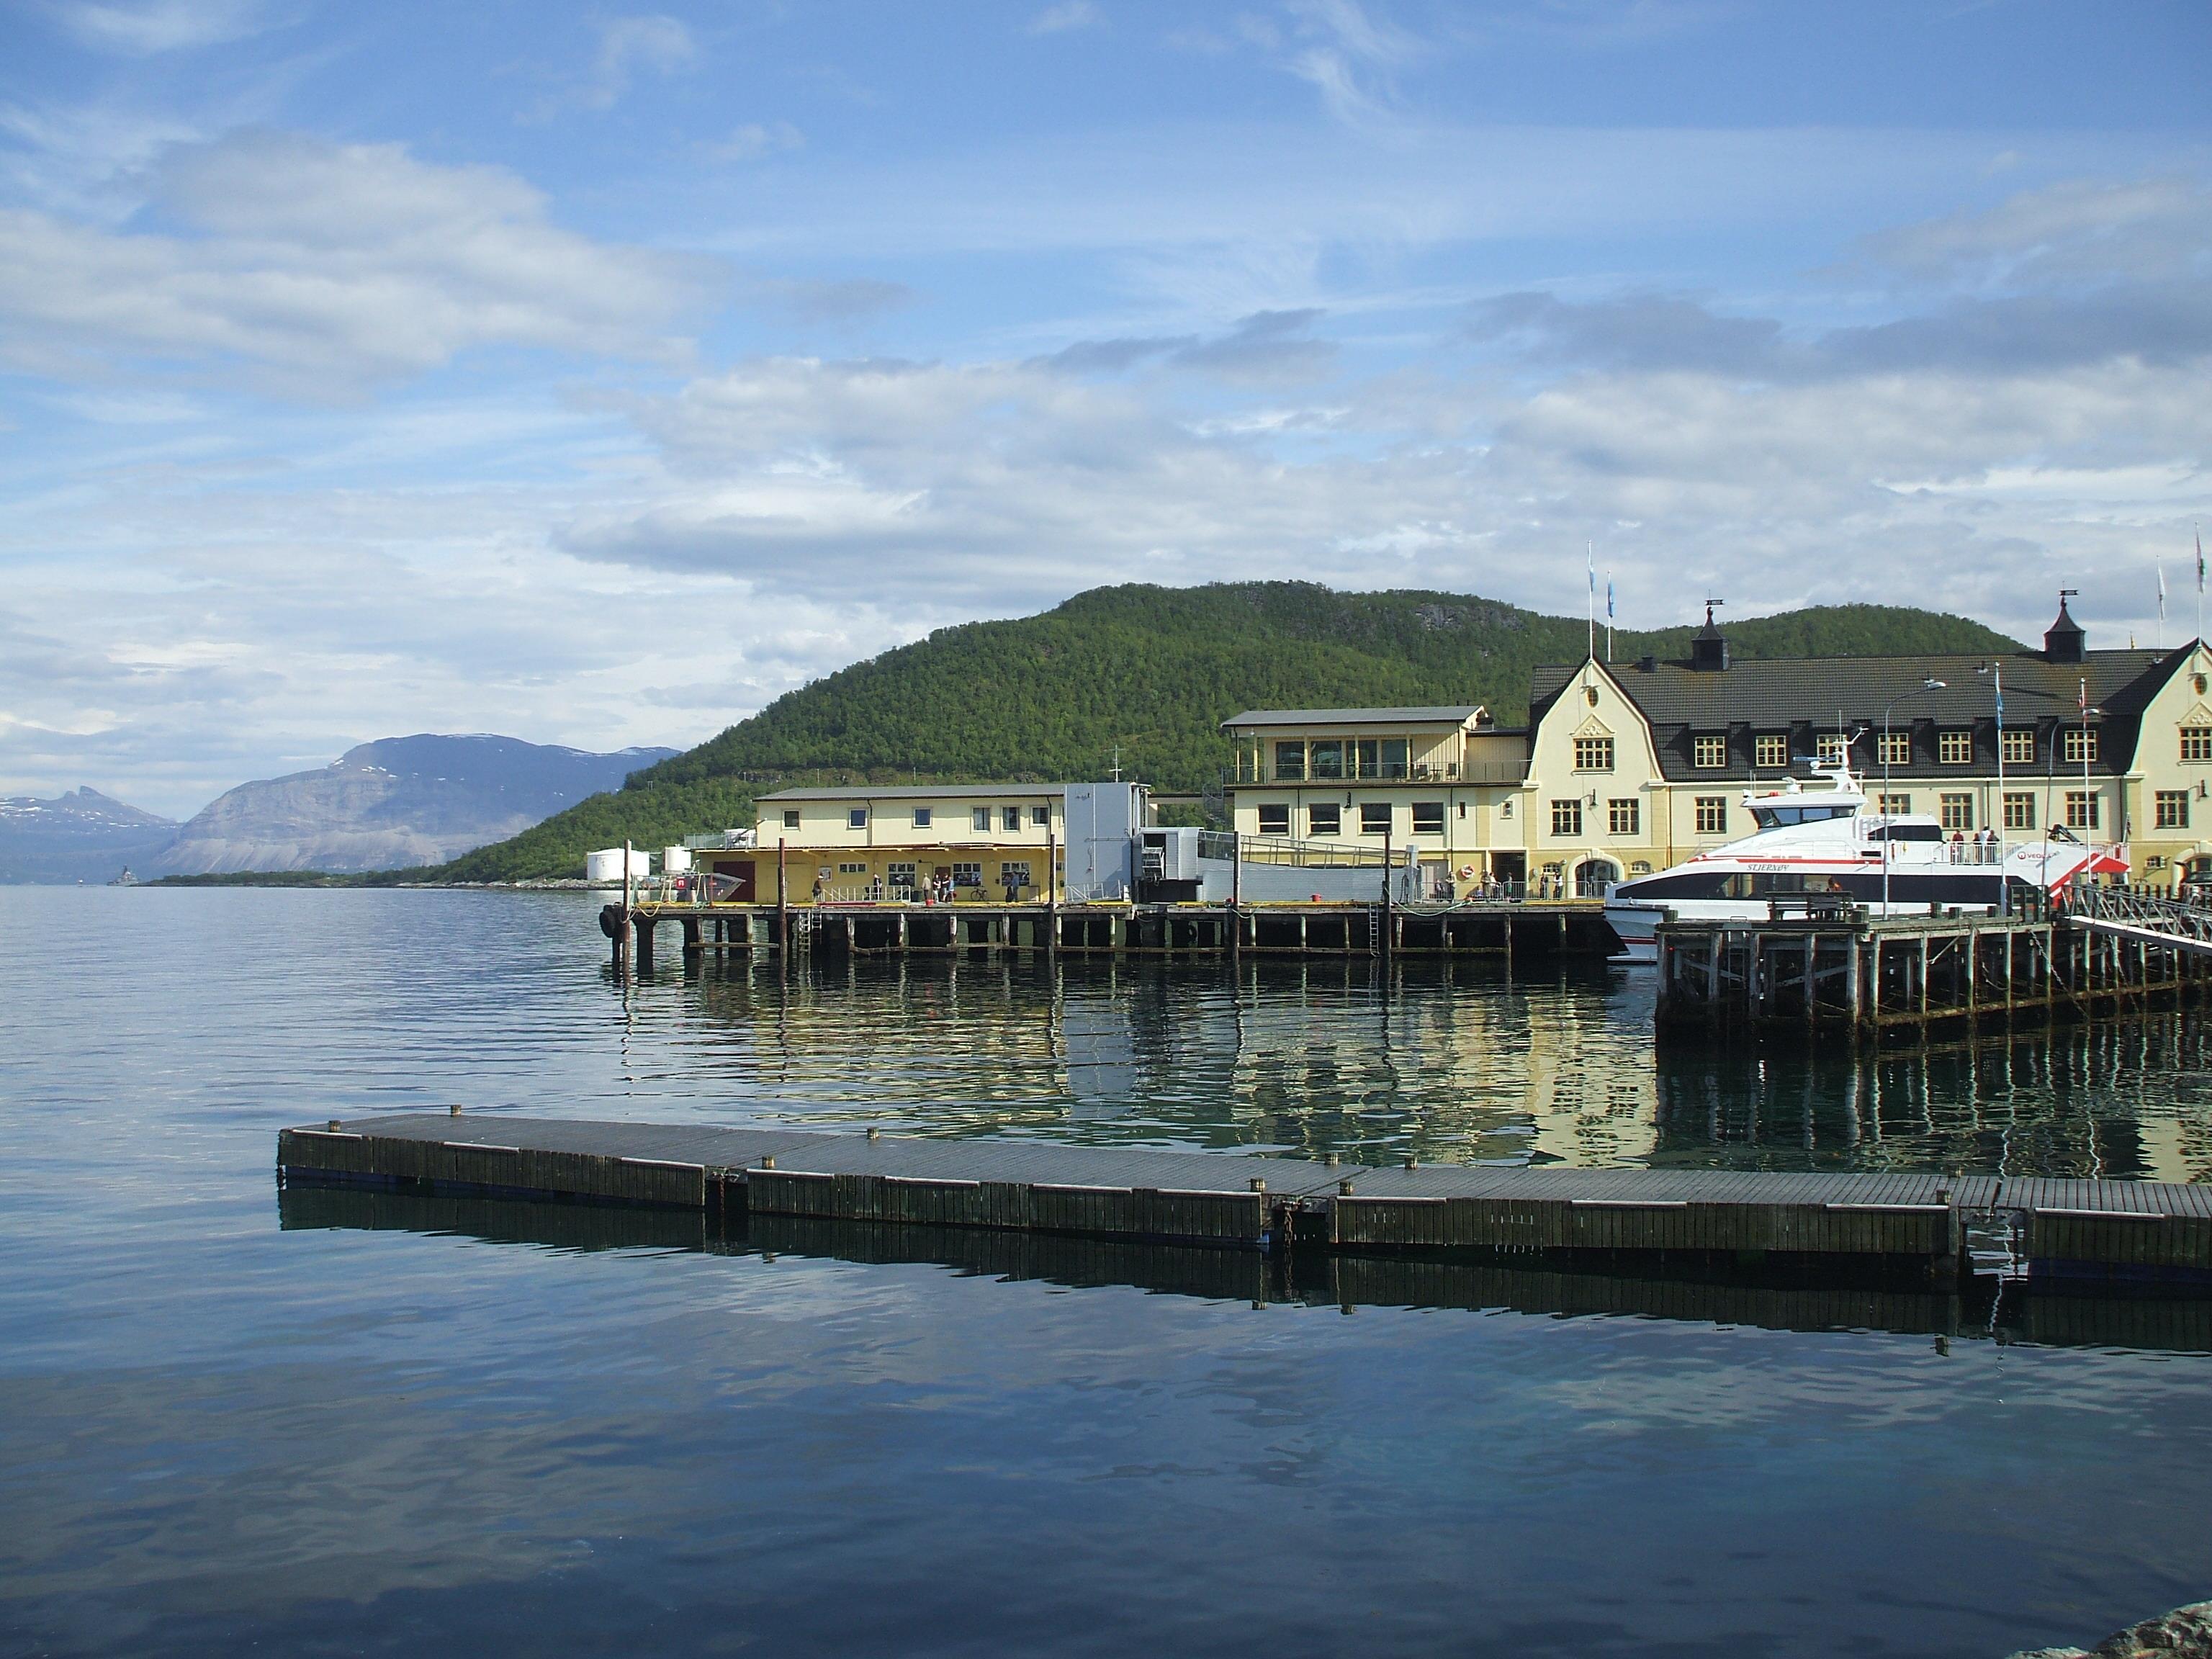 Noleggio Barche Lyngvær - Navalia | Noleggia un Sogno